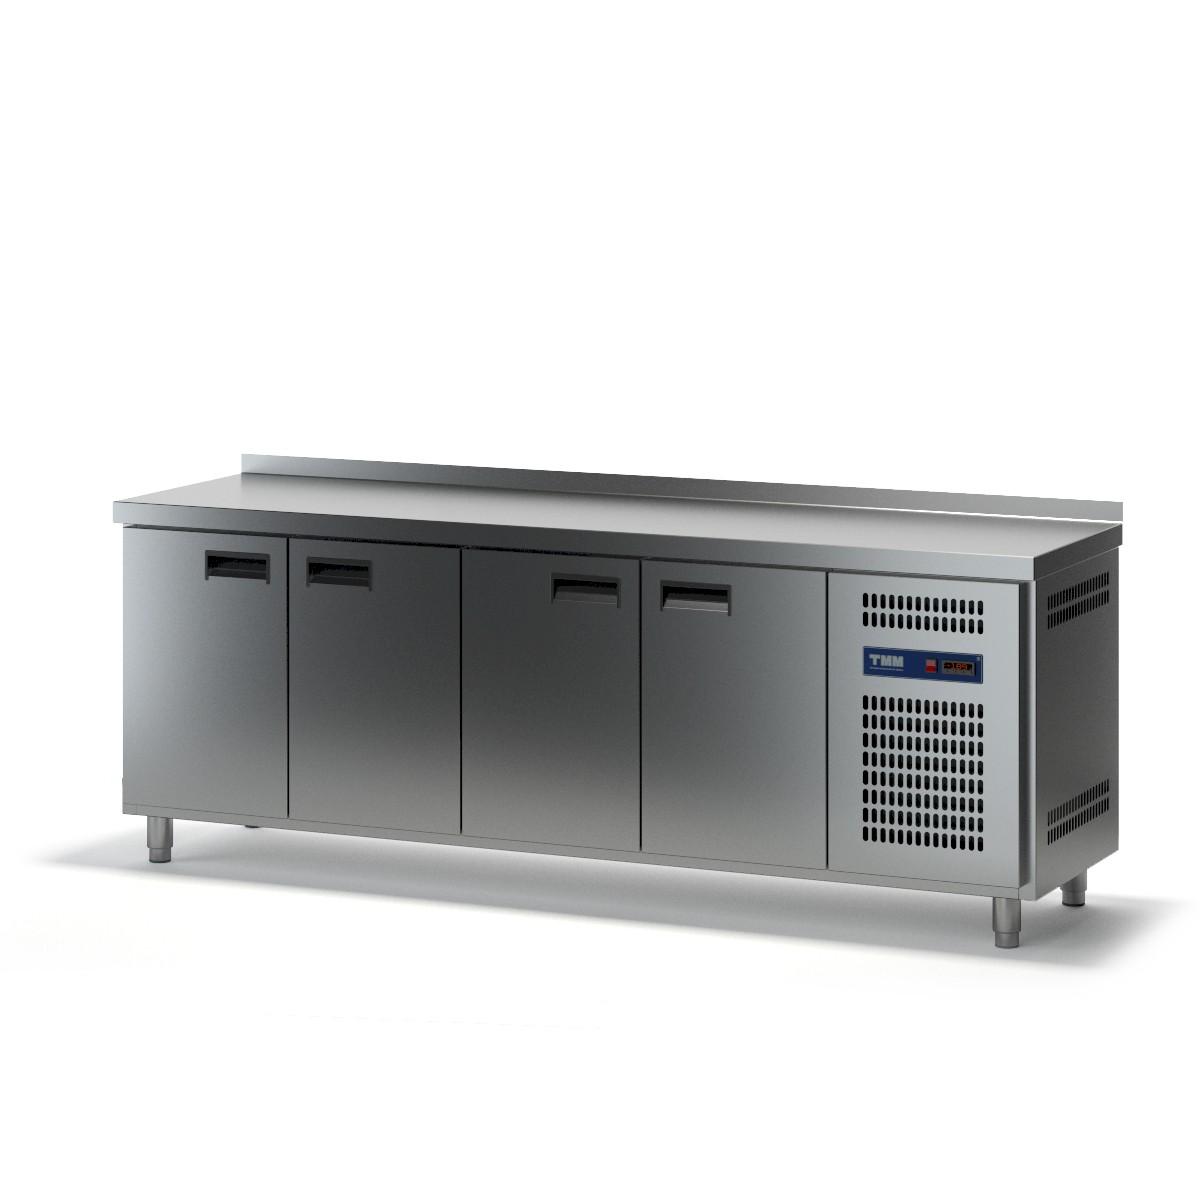 Стол холодильный четырехдверный СХСБ-1/4Д 2280х600